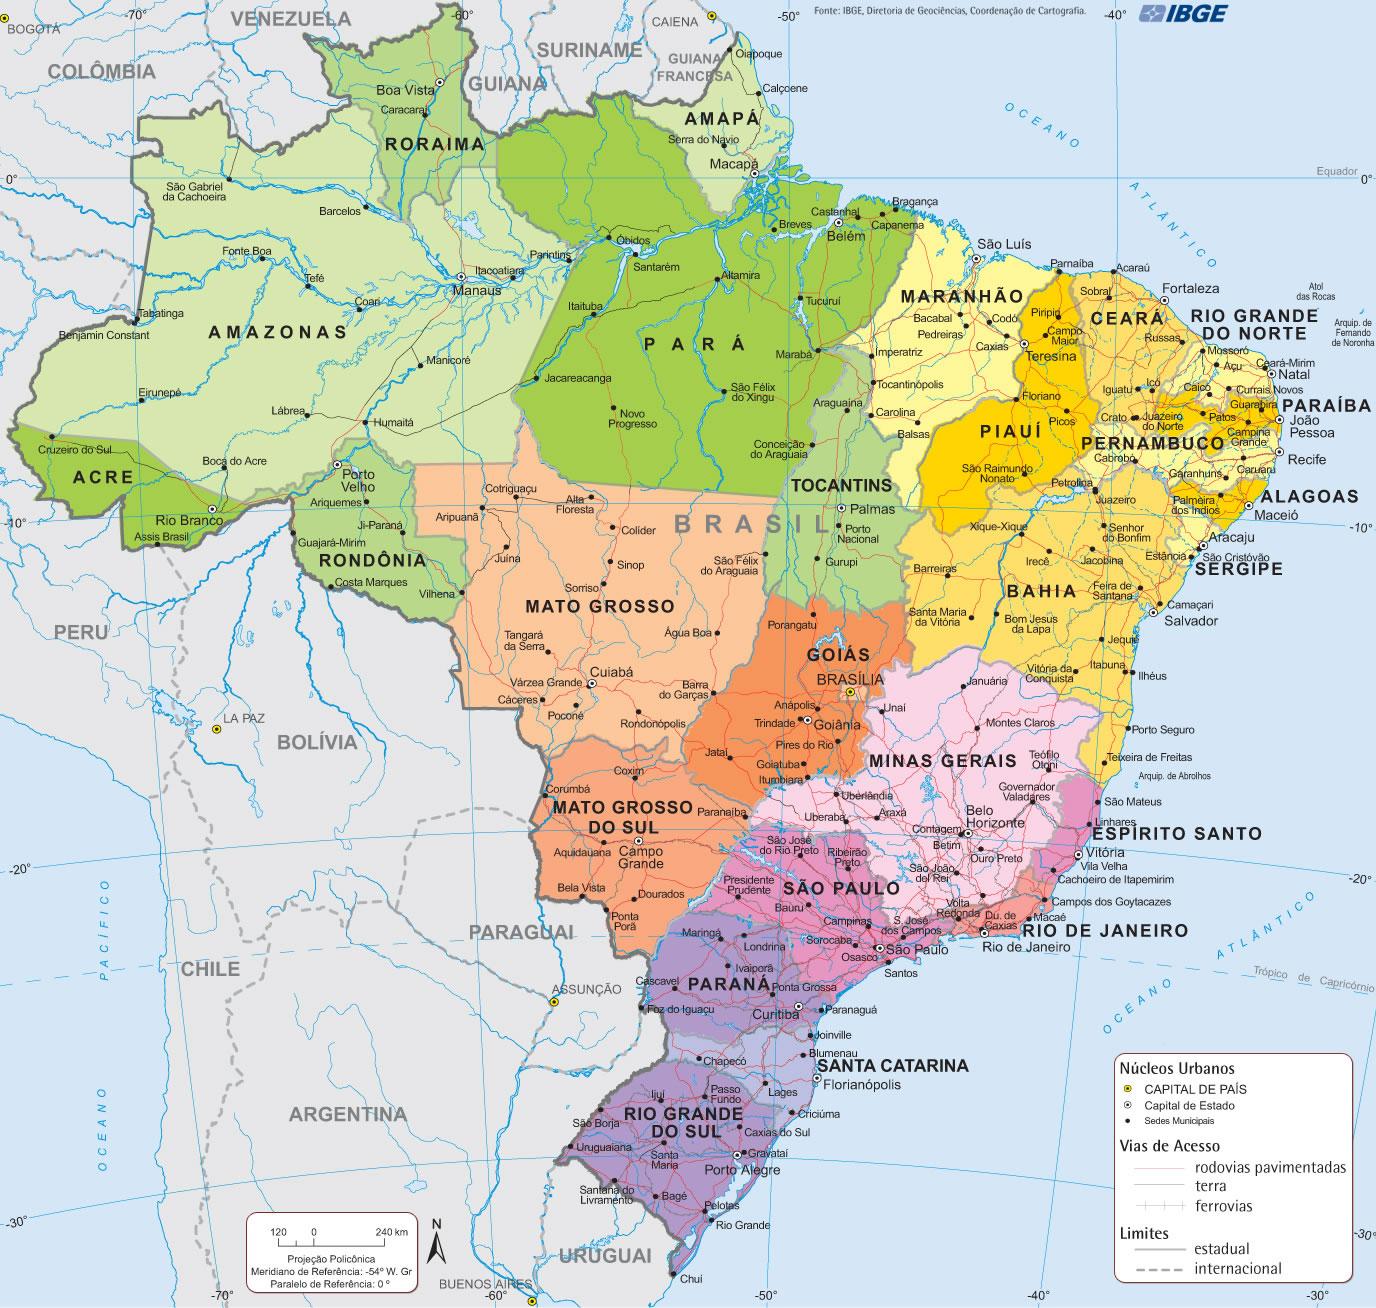 Carte Routiere Bresil.Carte Regions Bresil Carte Des Regions Du Bresil